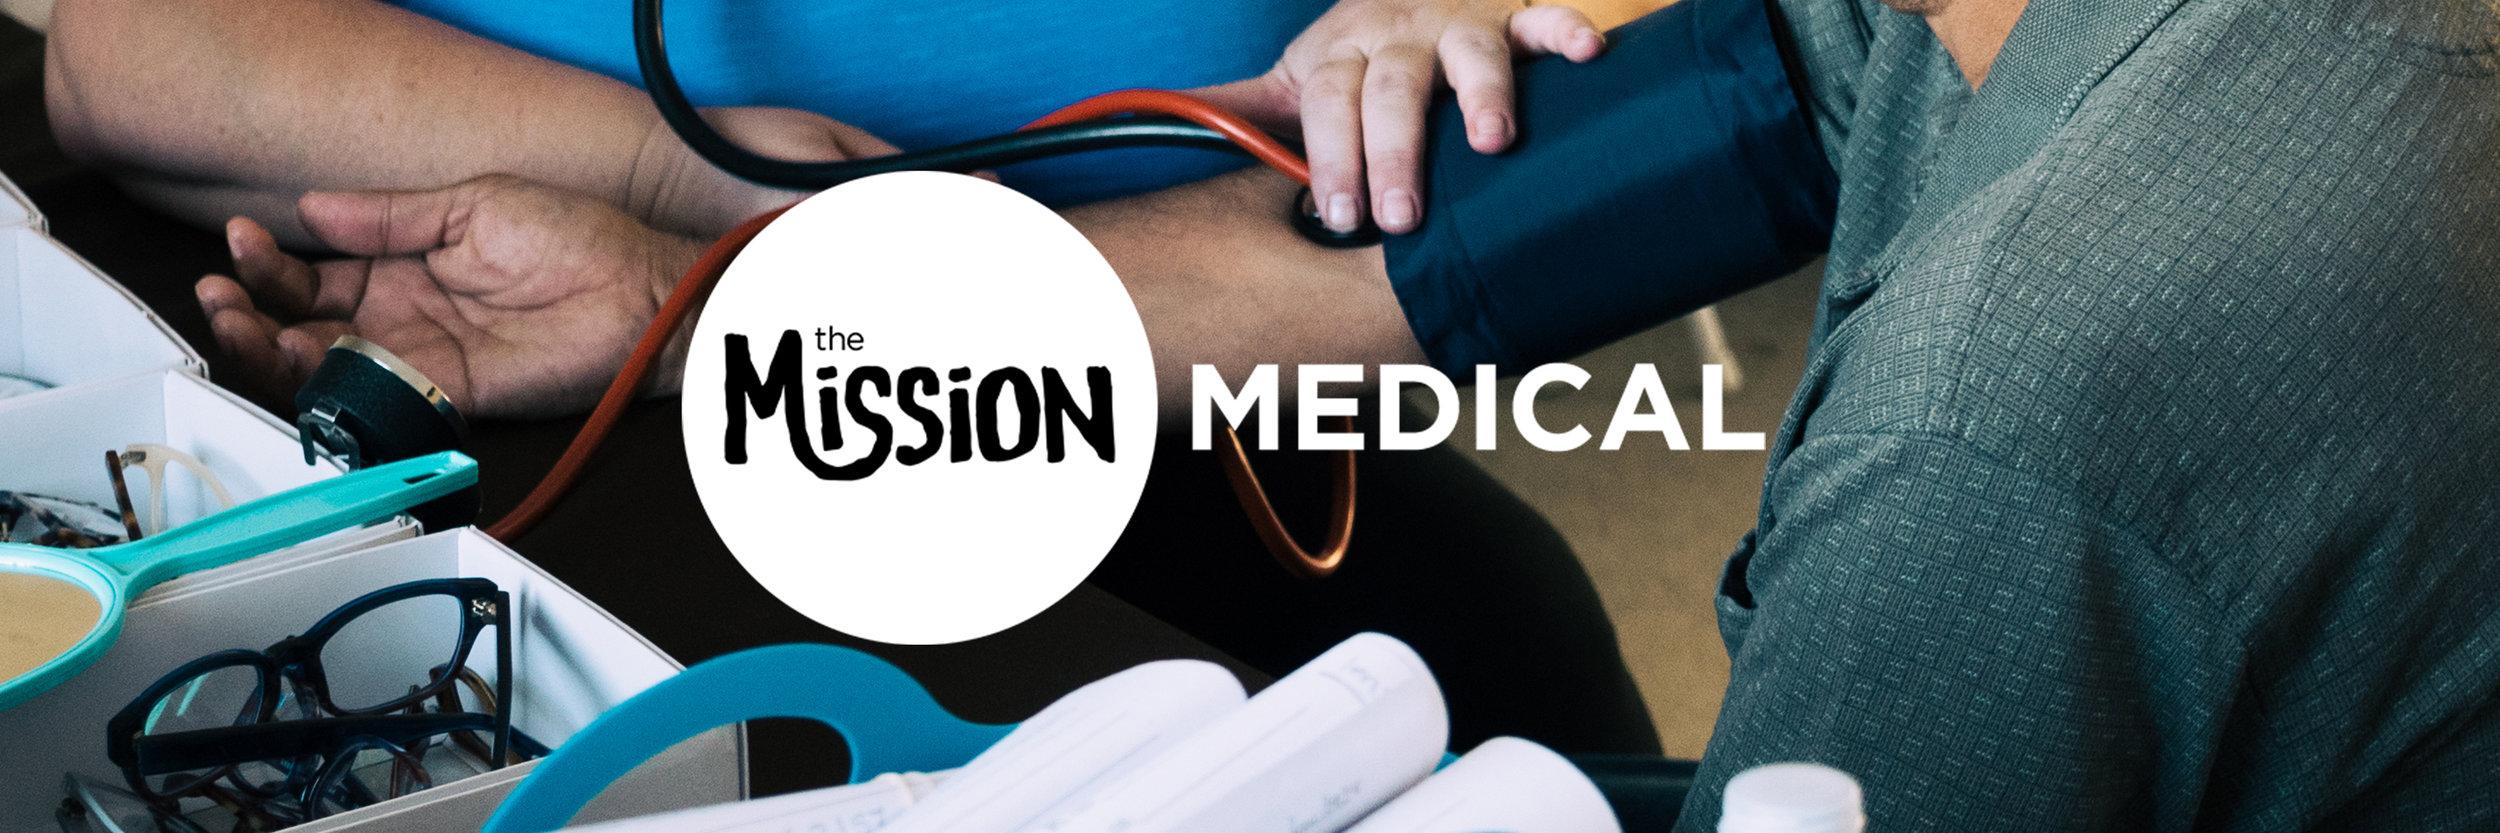 Medical Mission Image 5 panoramic.jpg